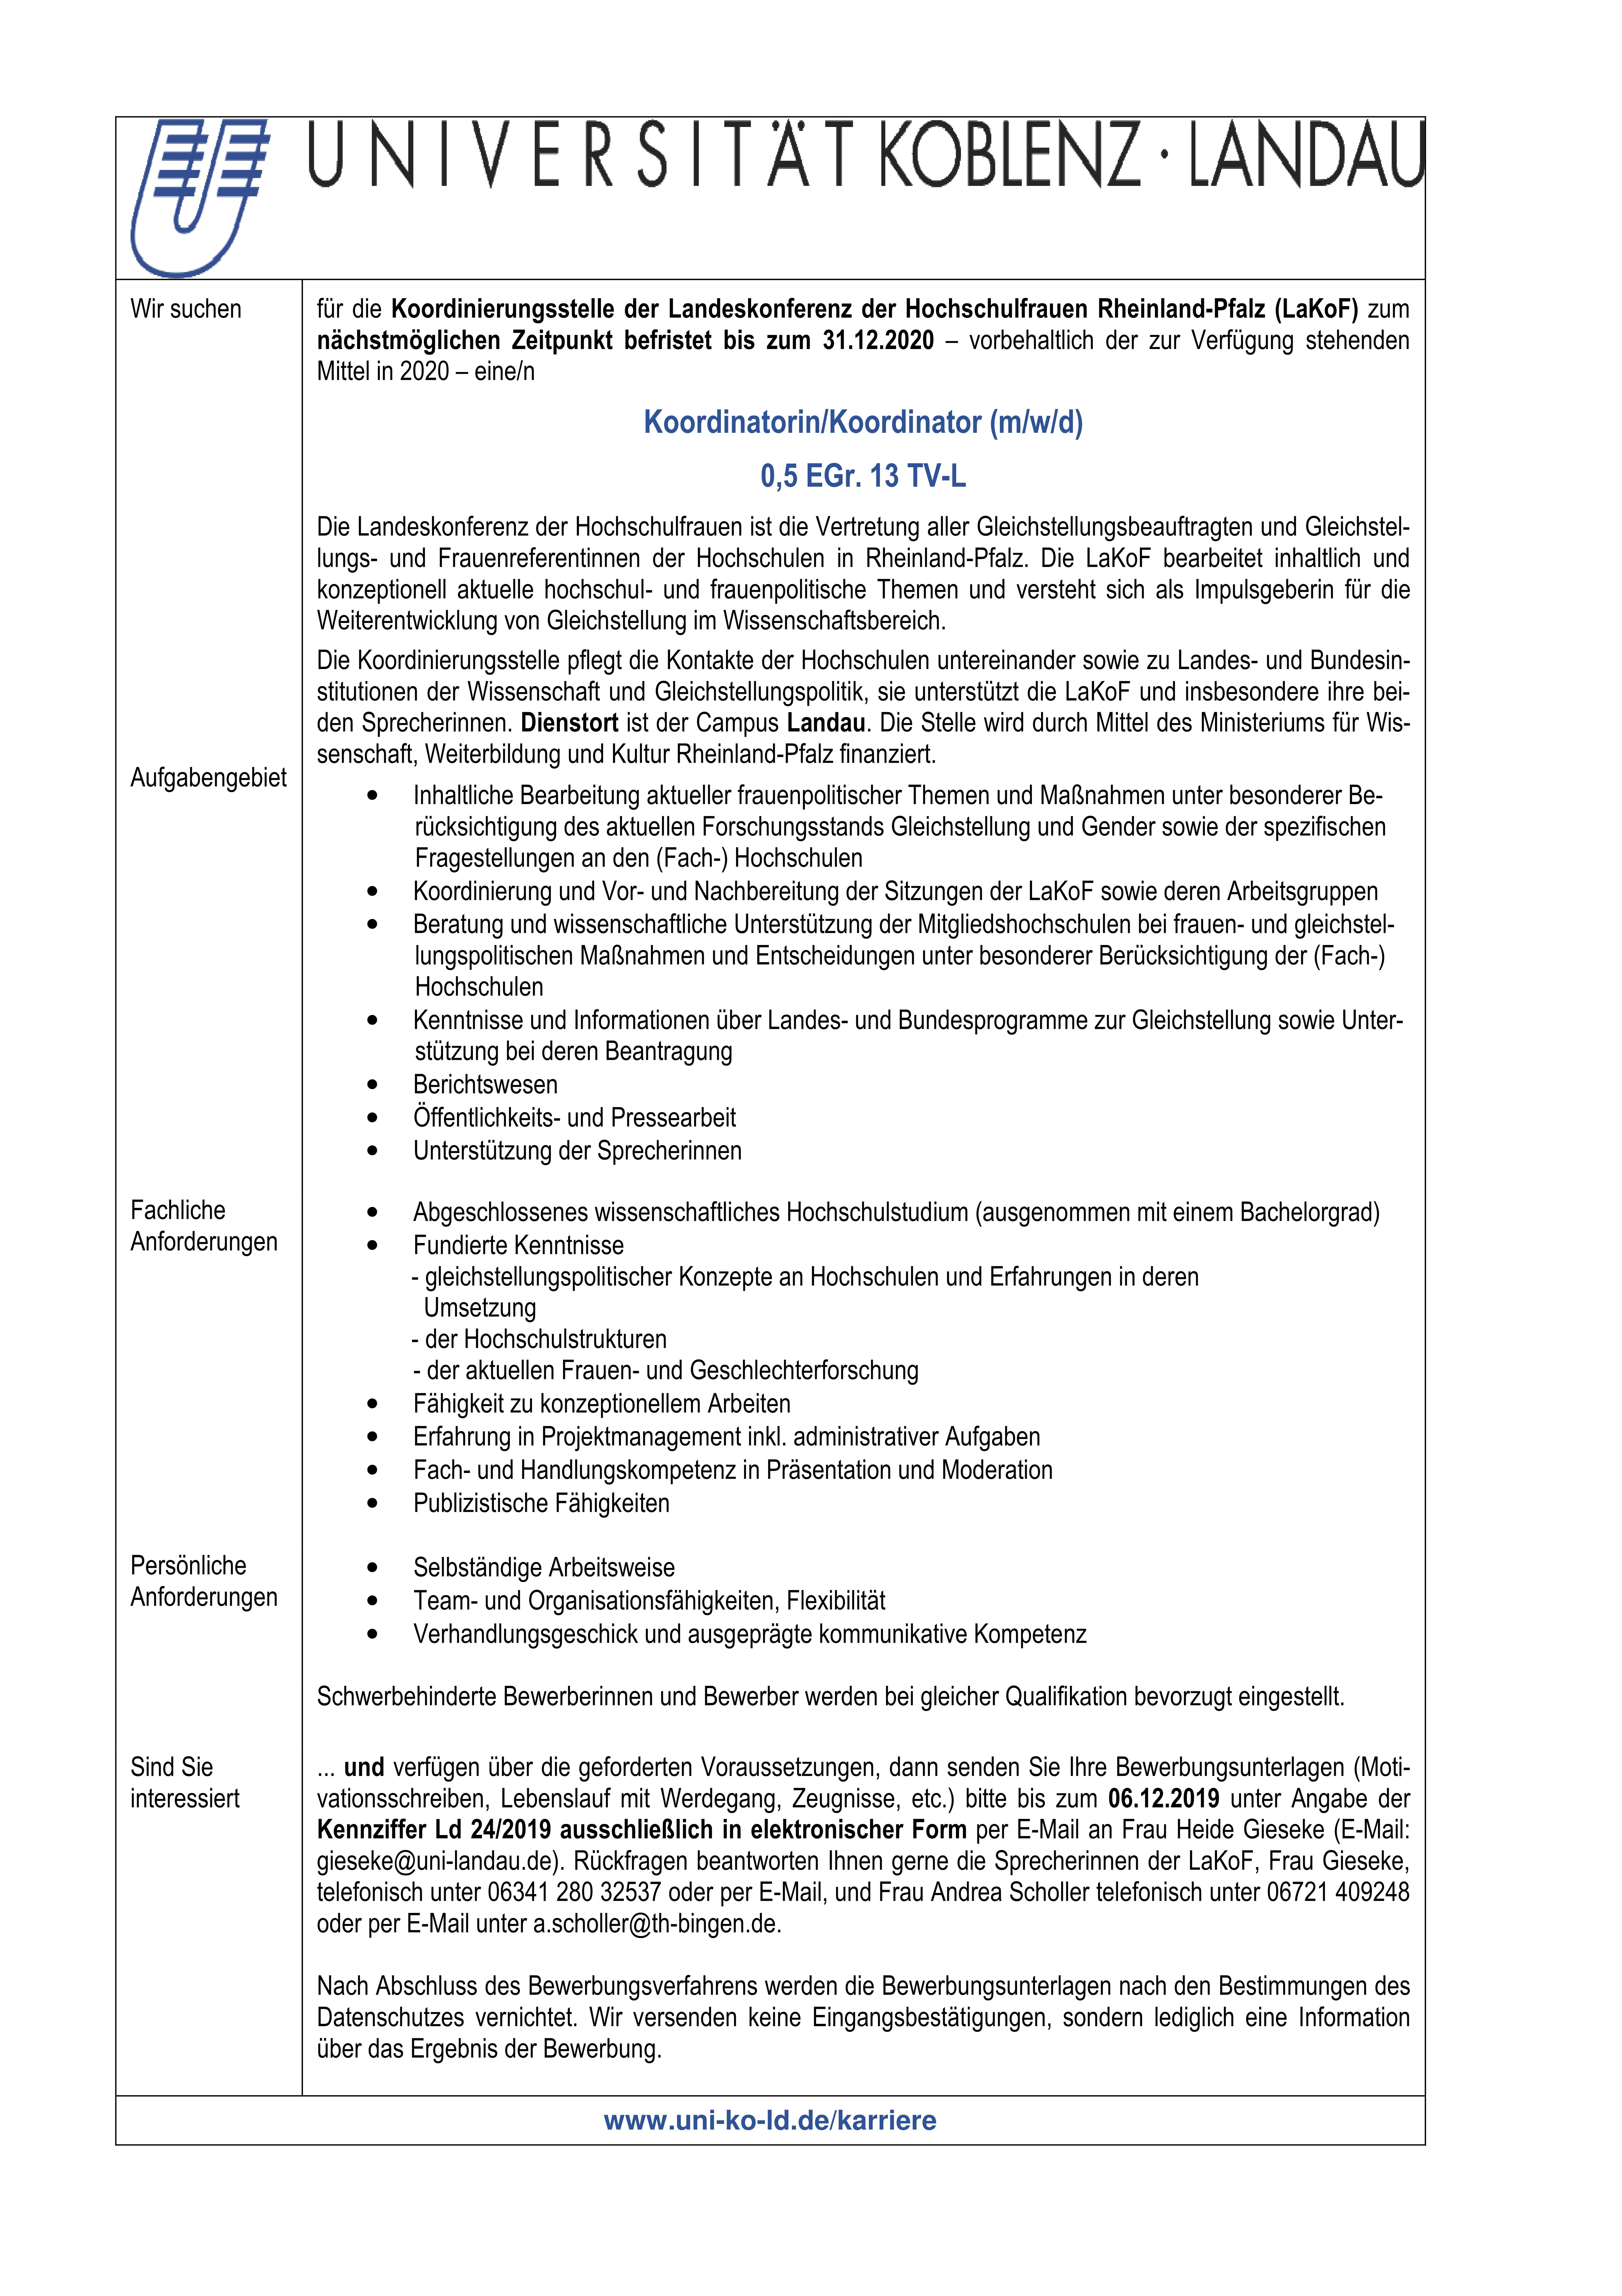 Stellenausschreibung Ld 24-2019 - Koordinierung LaKoF - Frauenbüro - befristet.jpg